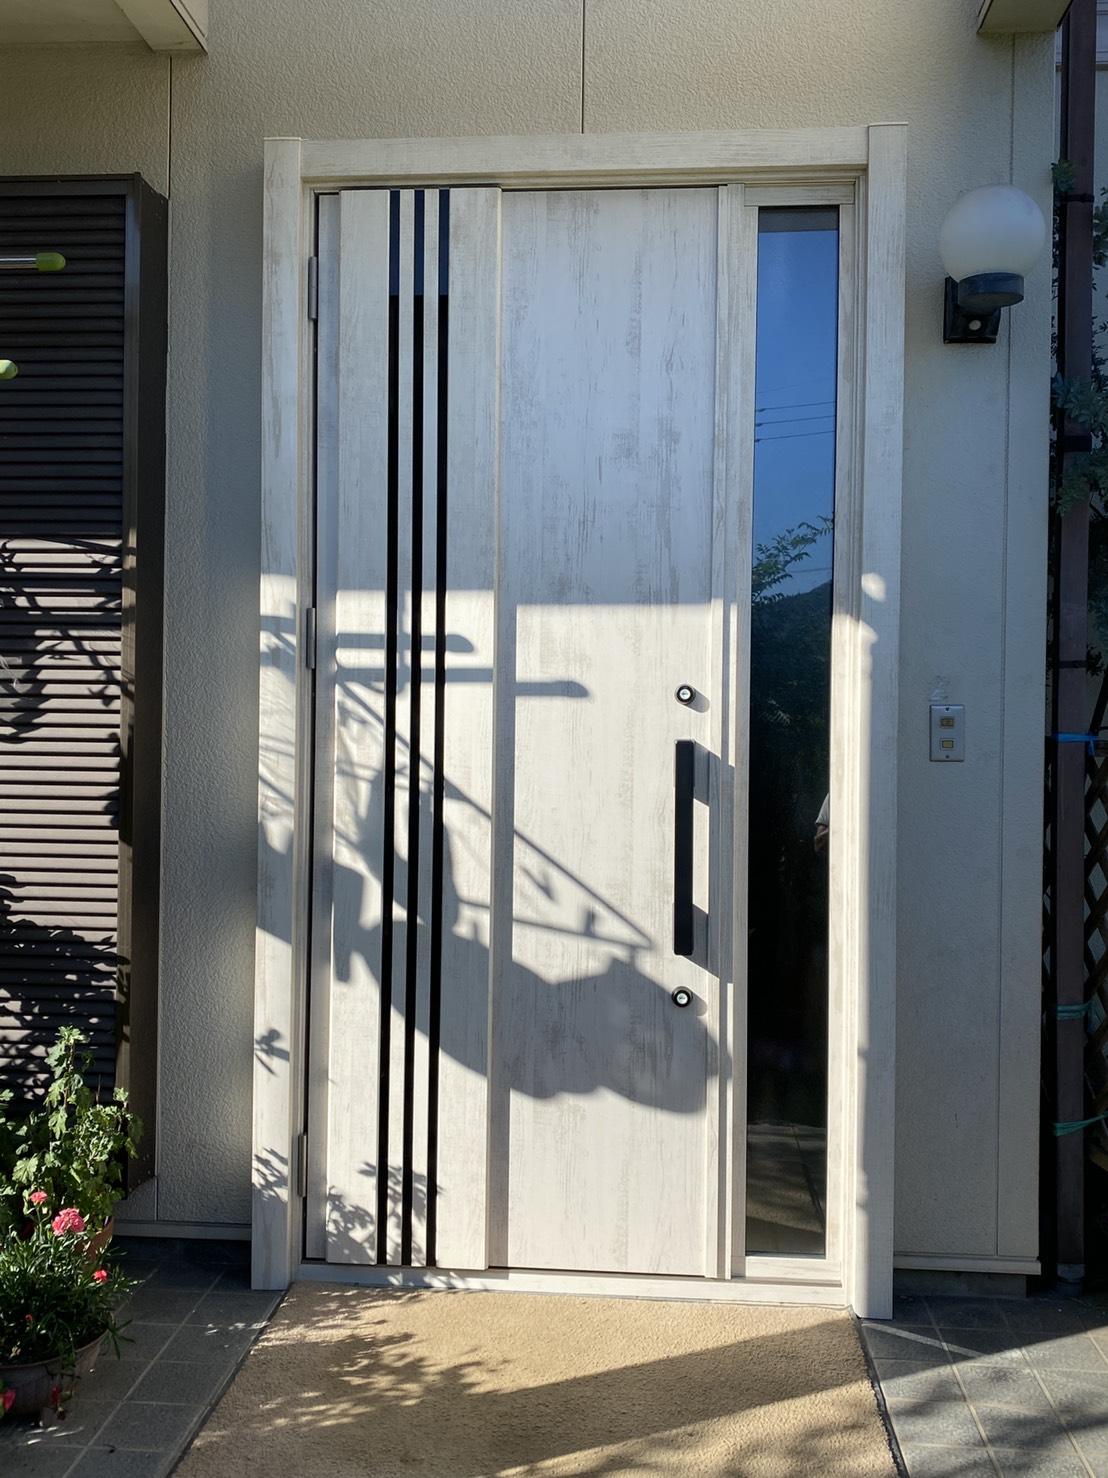 M Baseの*玄関ドアの入替え工事*の施工事例写真